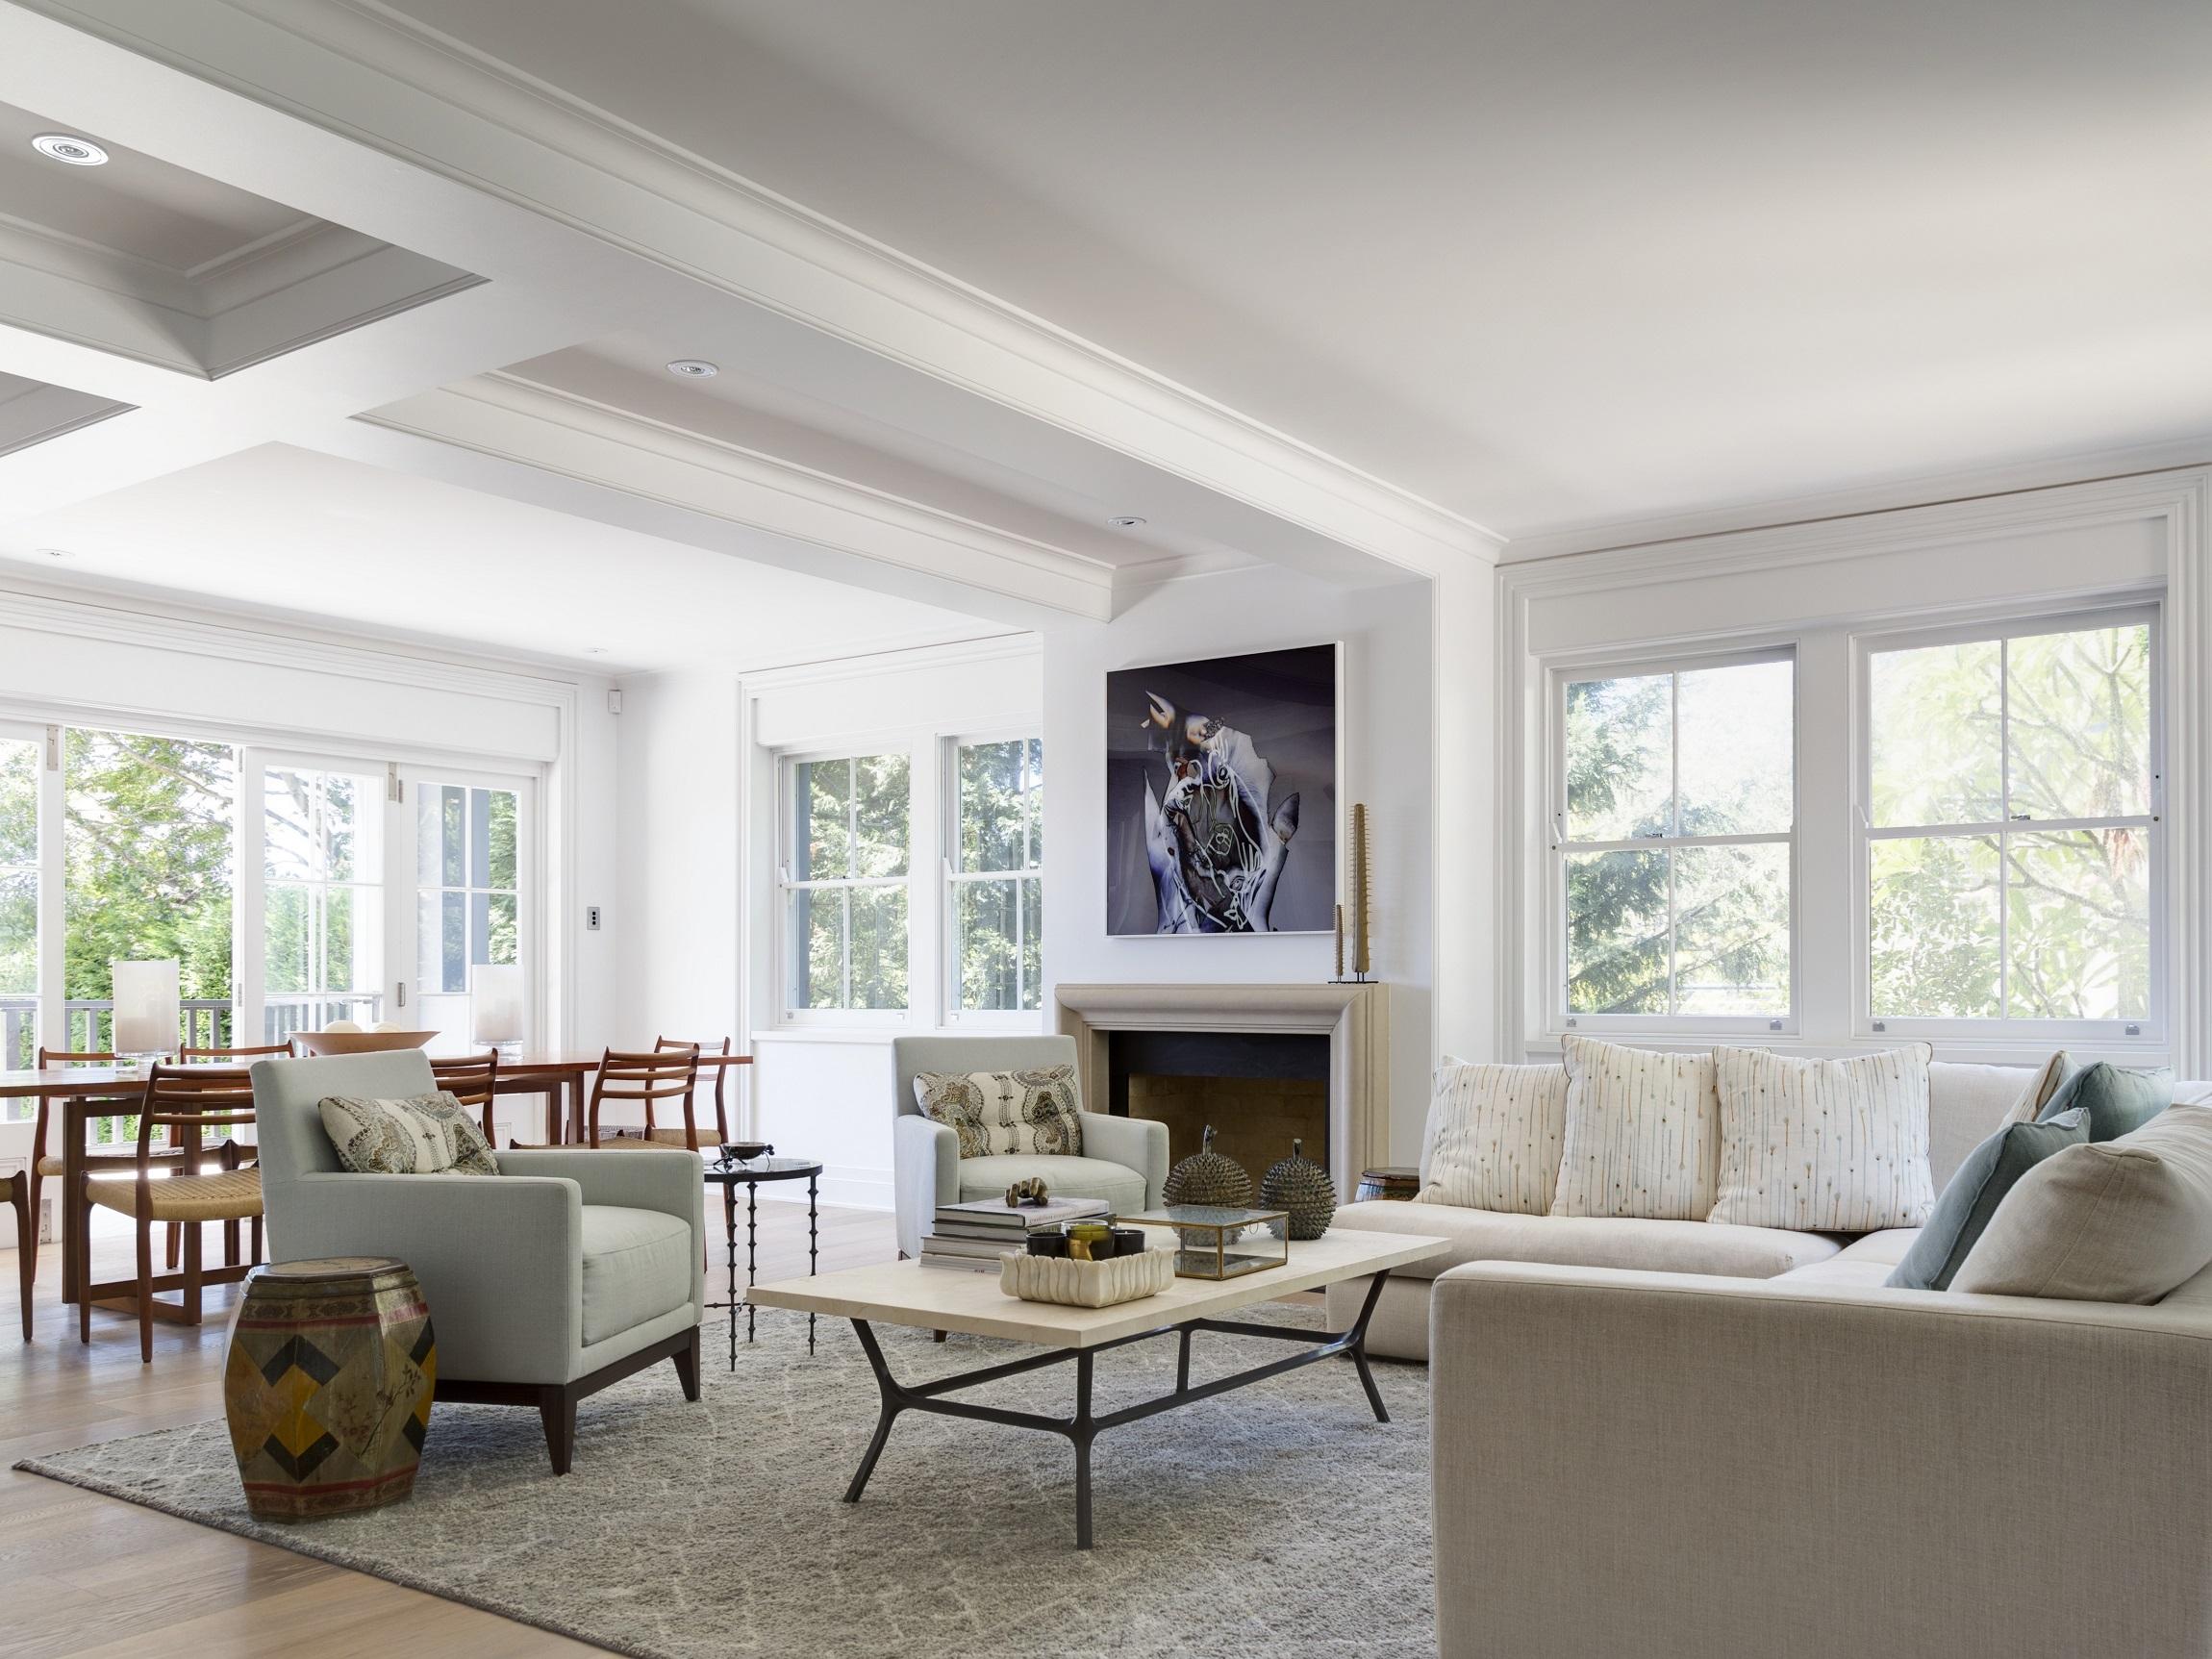 Art-Deco-Interior-Design-Living-Room-Bellevue-Hill-Michael-Bell-ArchitectsArt-Deco-Interior-Design-Living-Room-Bellevue-Hill-Michael-Bell-Architects